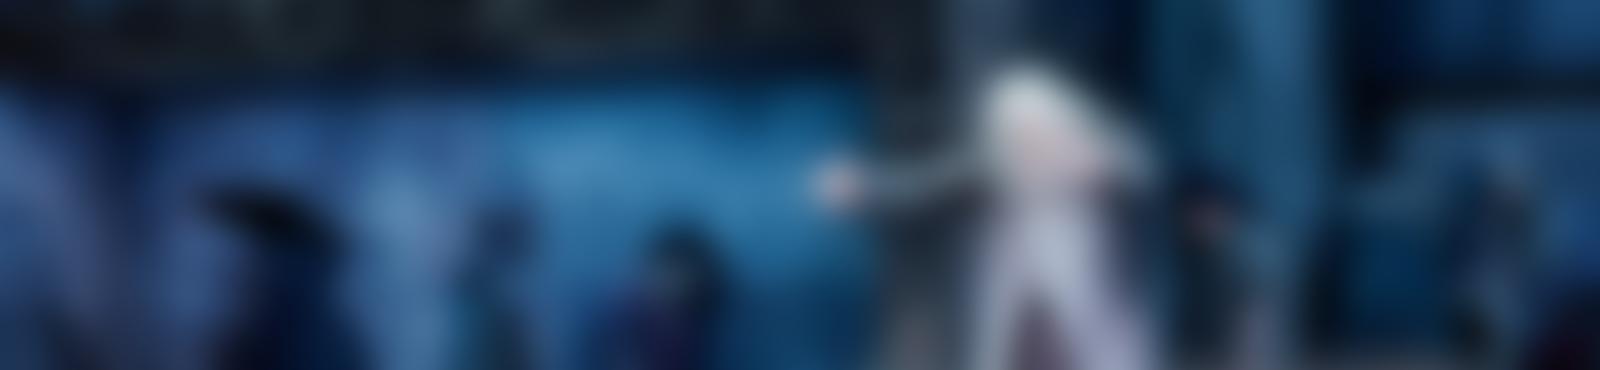 Blurred c4032319 711c 4e05 b61c a14188ddea7e